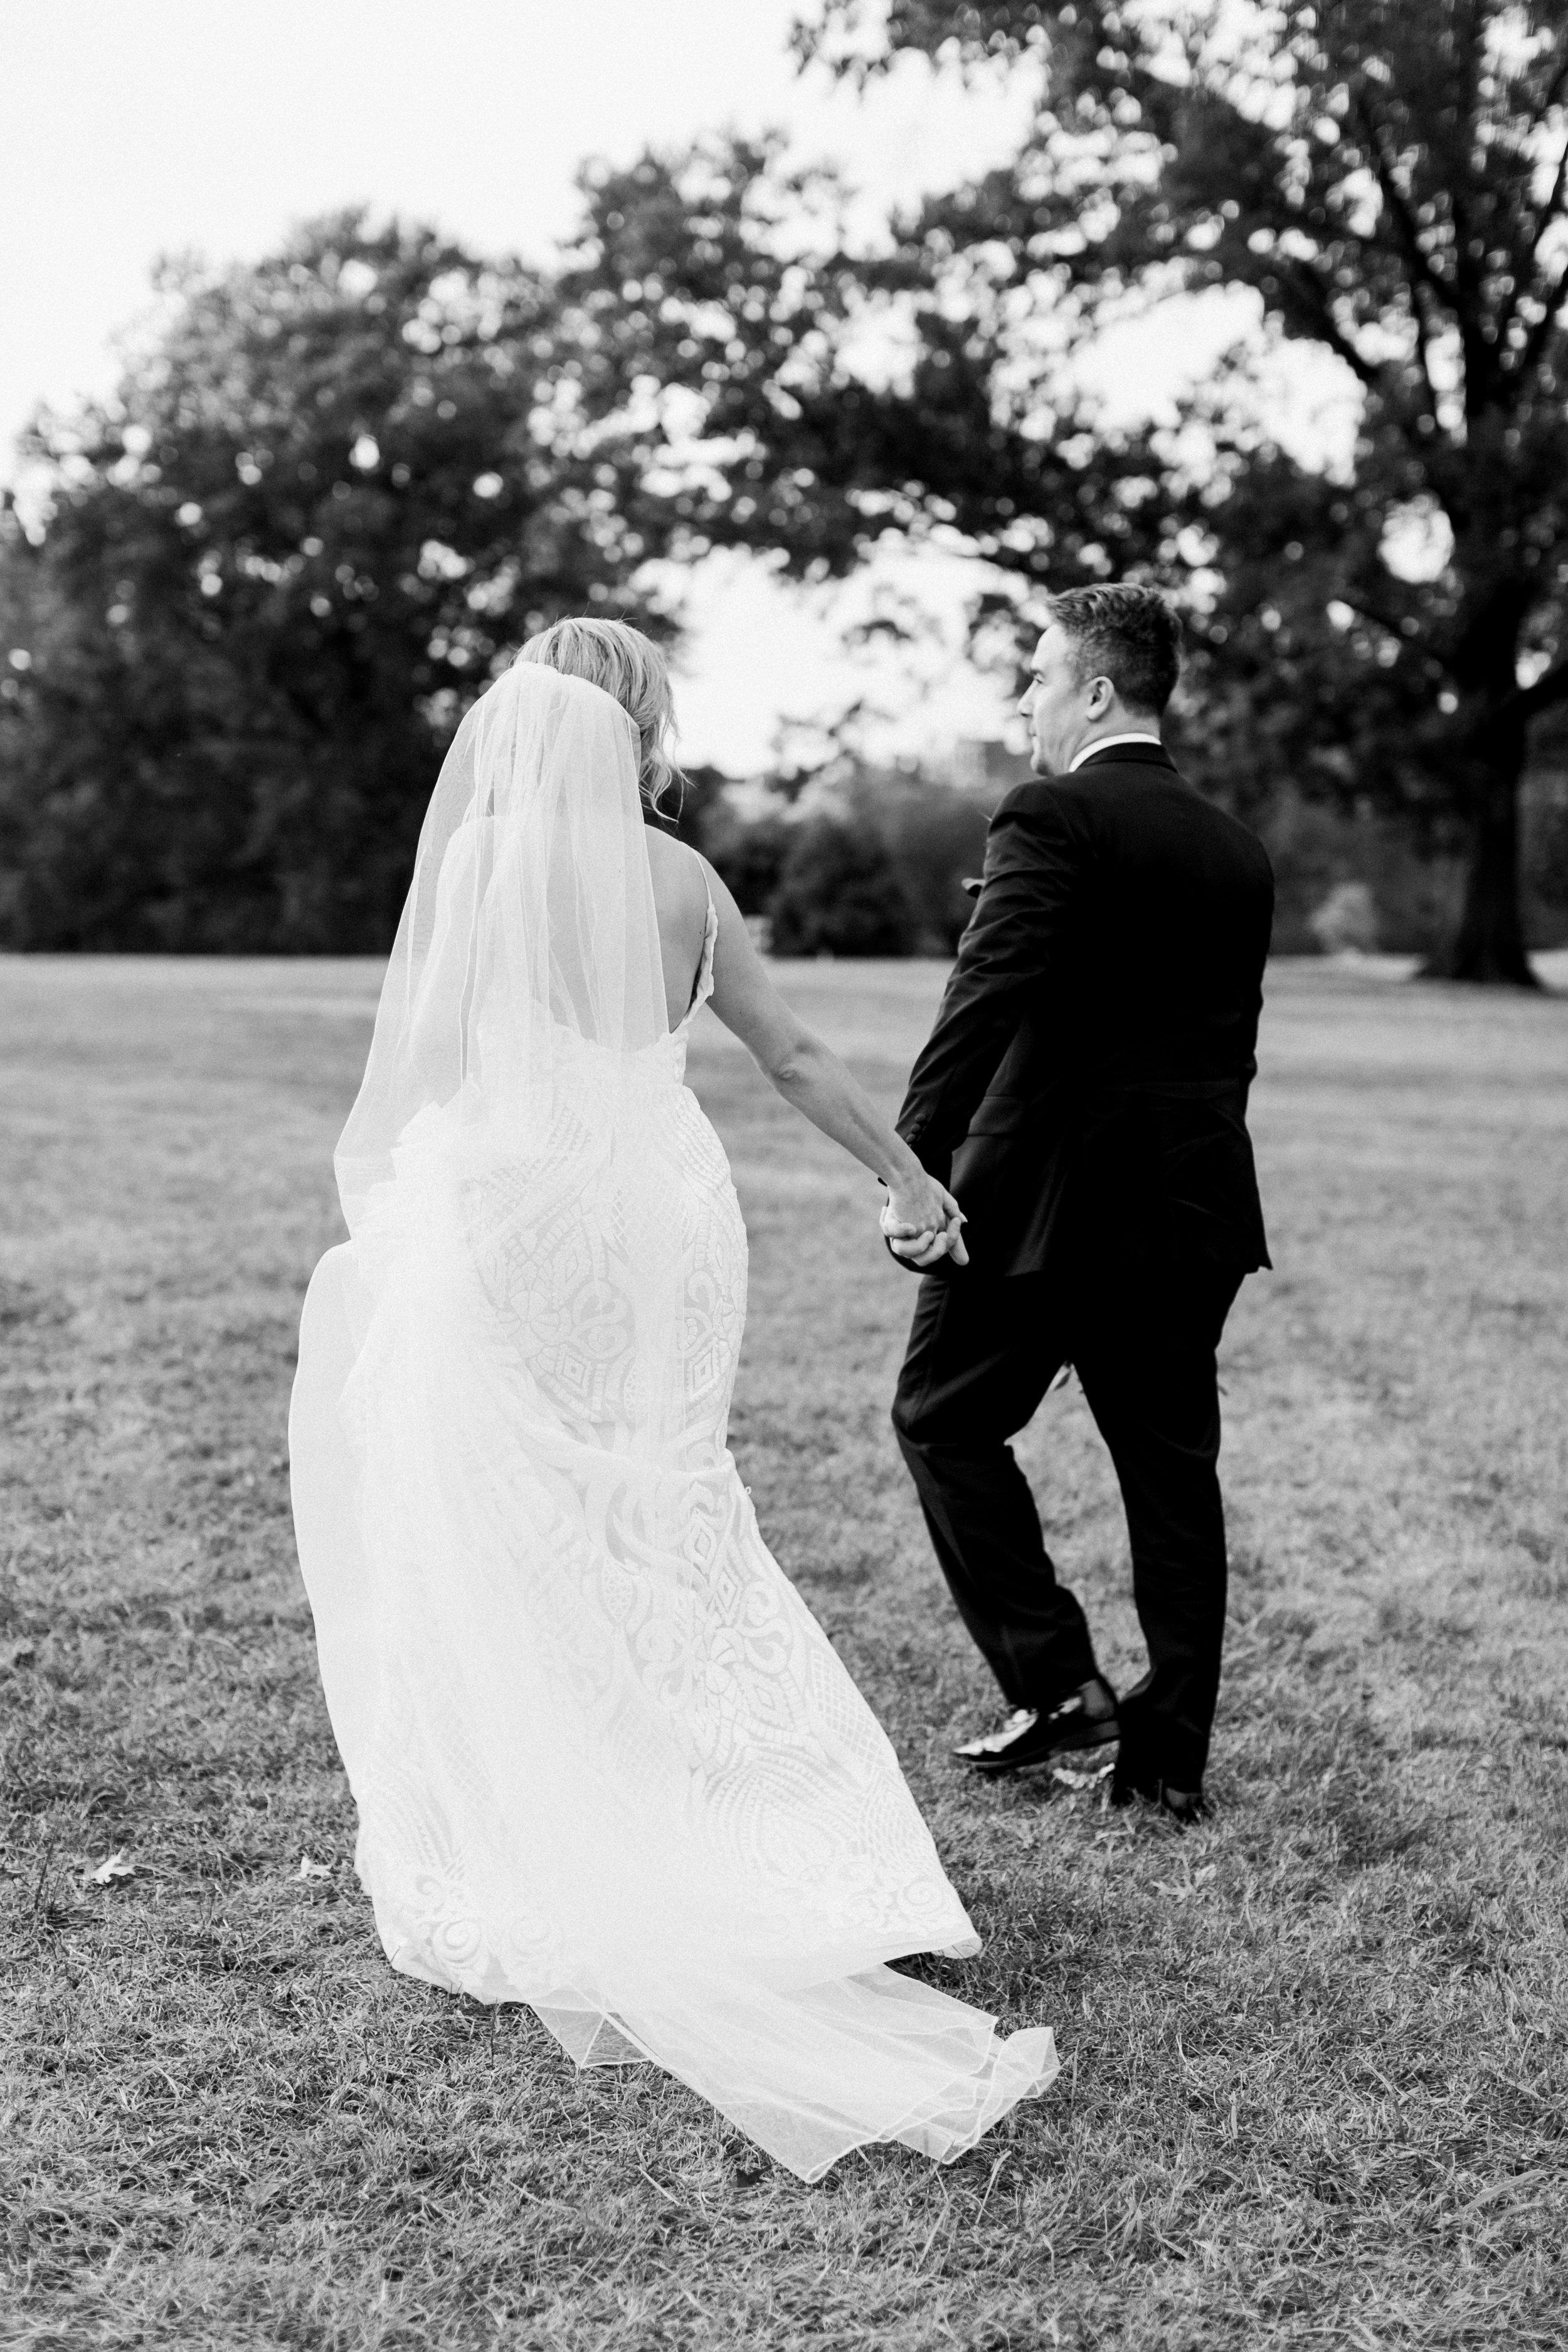 DavidAmandaMundy-Wedding-10282017-KathrynIvyPhotography-370.jpg